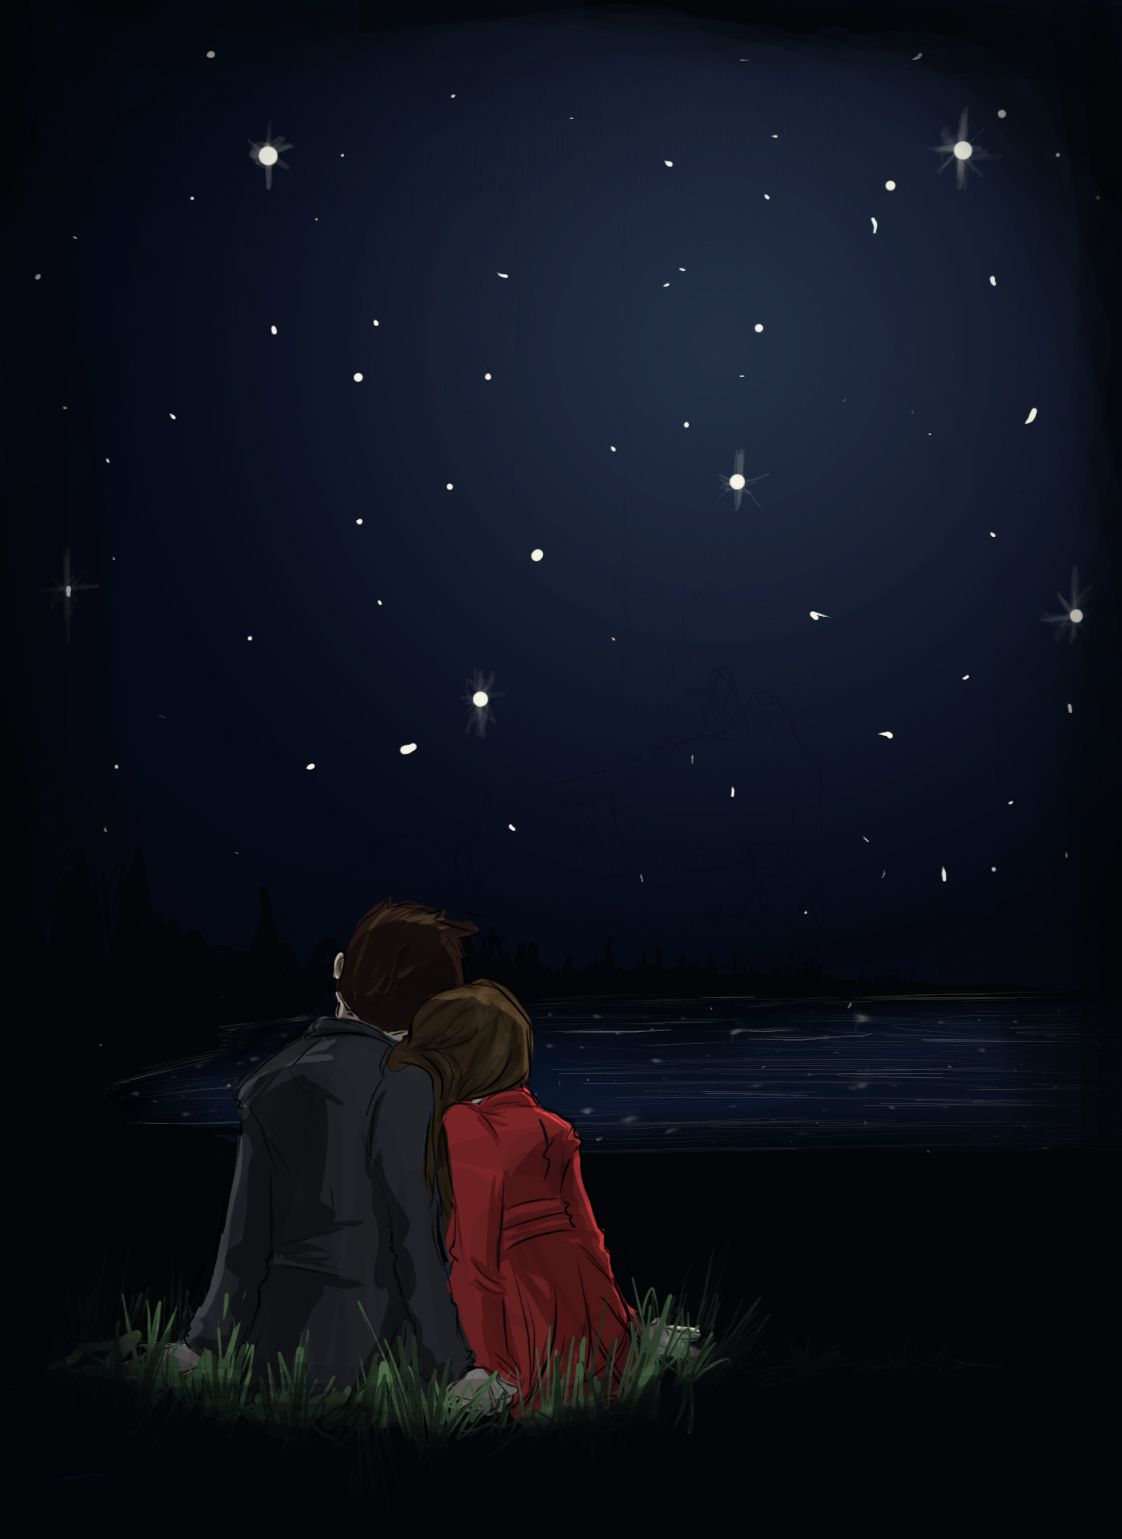 Pin By Farzana Tanwi On Stationary Anime Love Couple Love Drawings Love Cartoon Couple